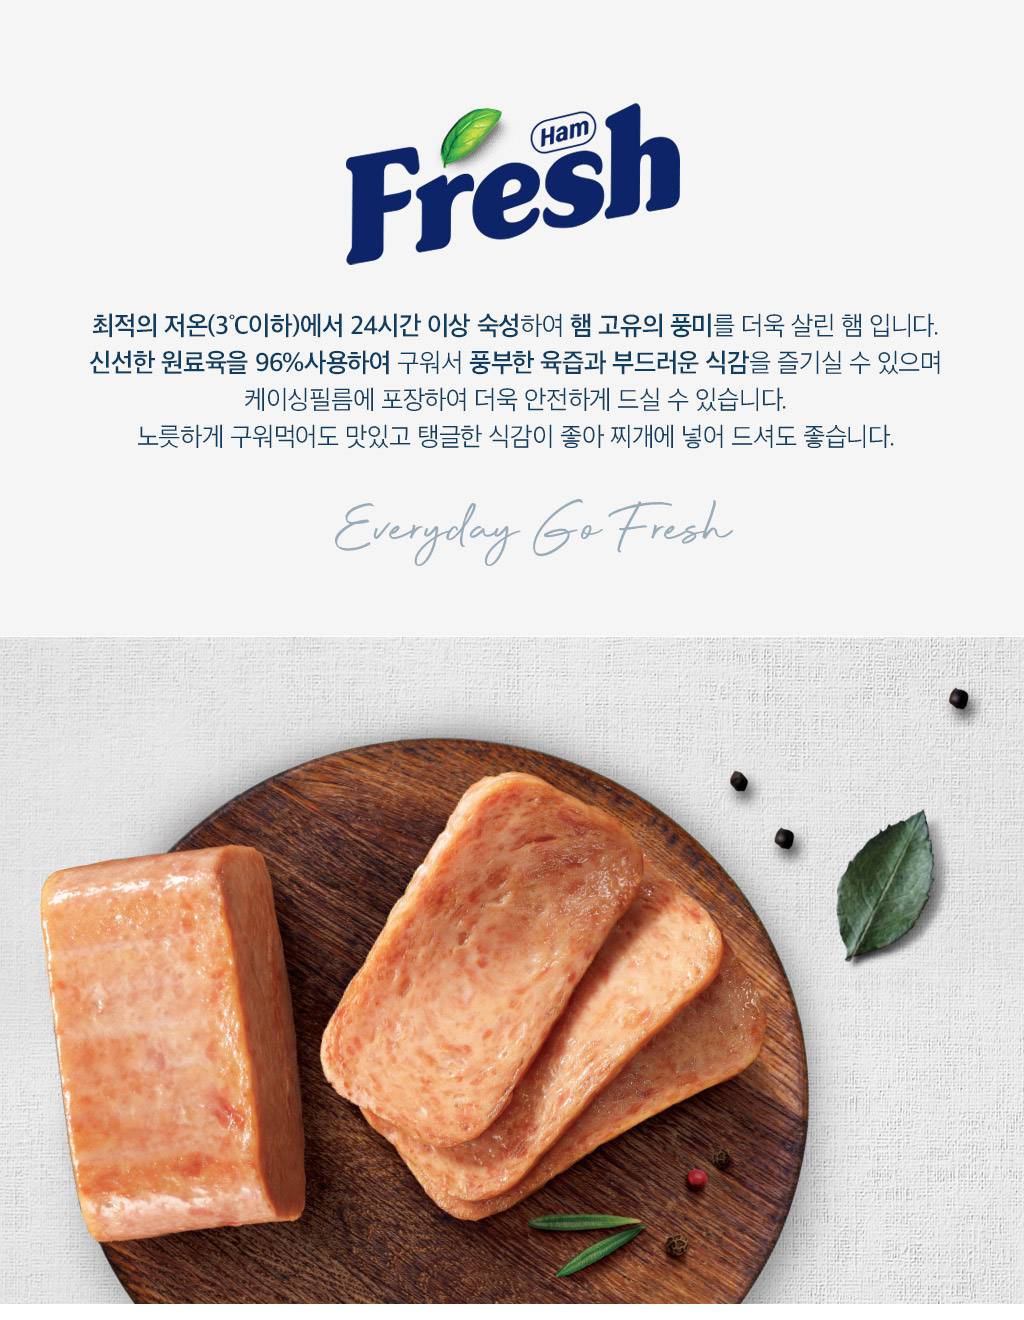 Fresh Ham(상세 내용은 하단 참고)